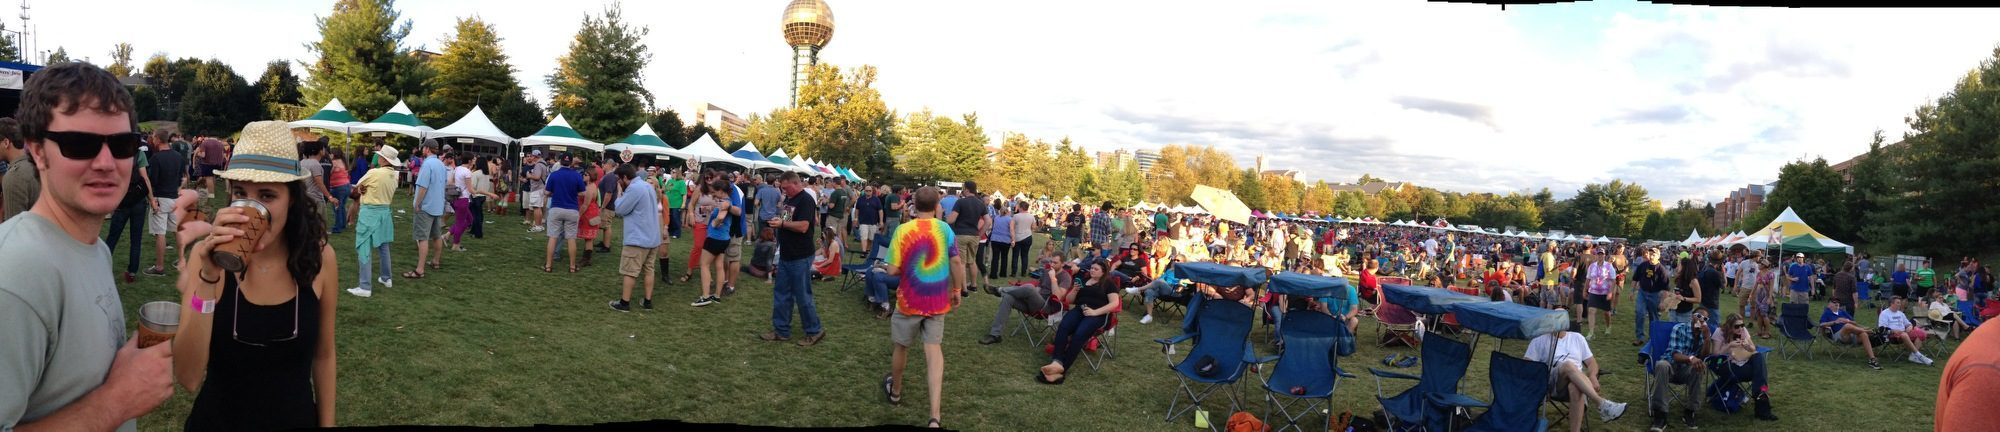 Brewers' Jam scene